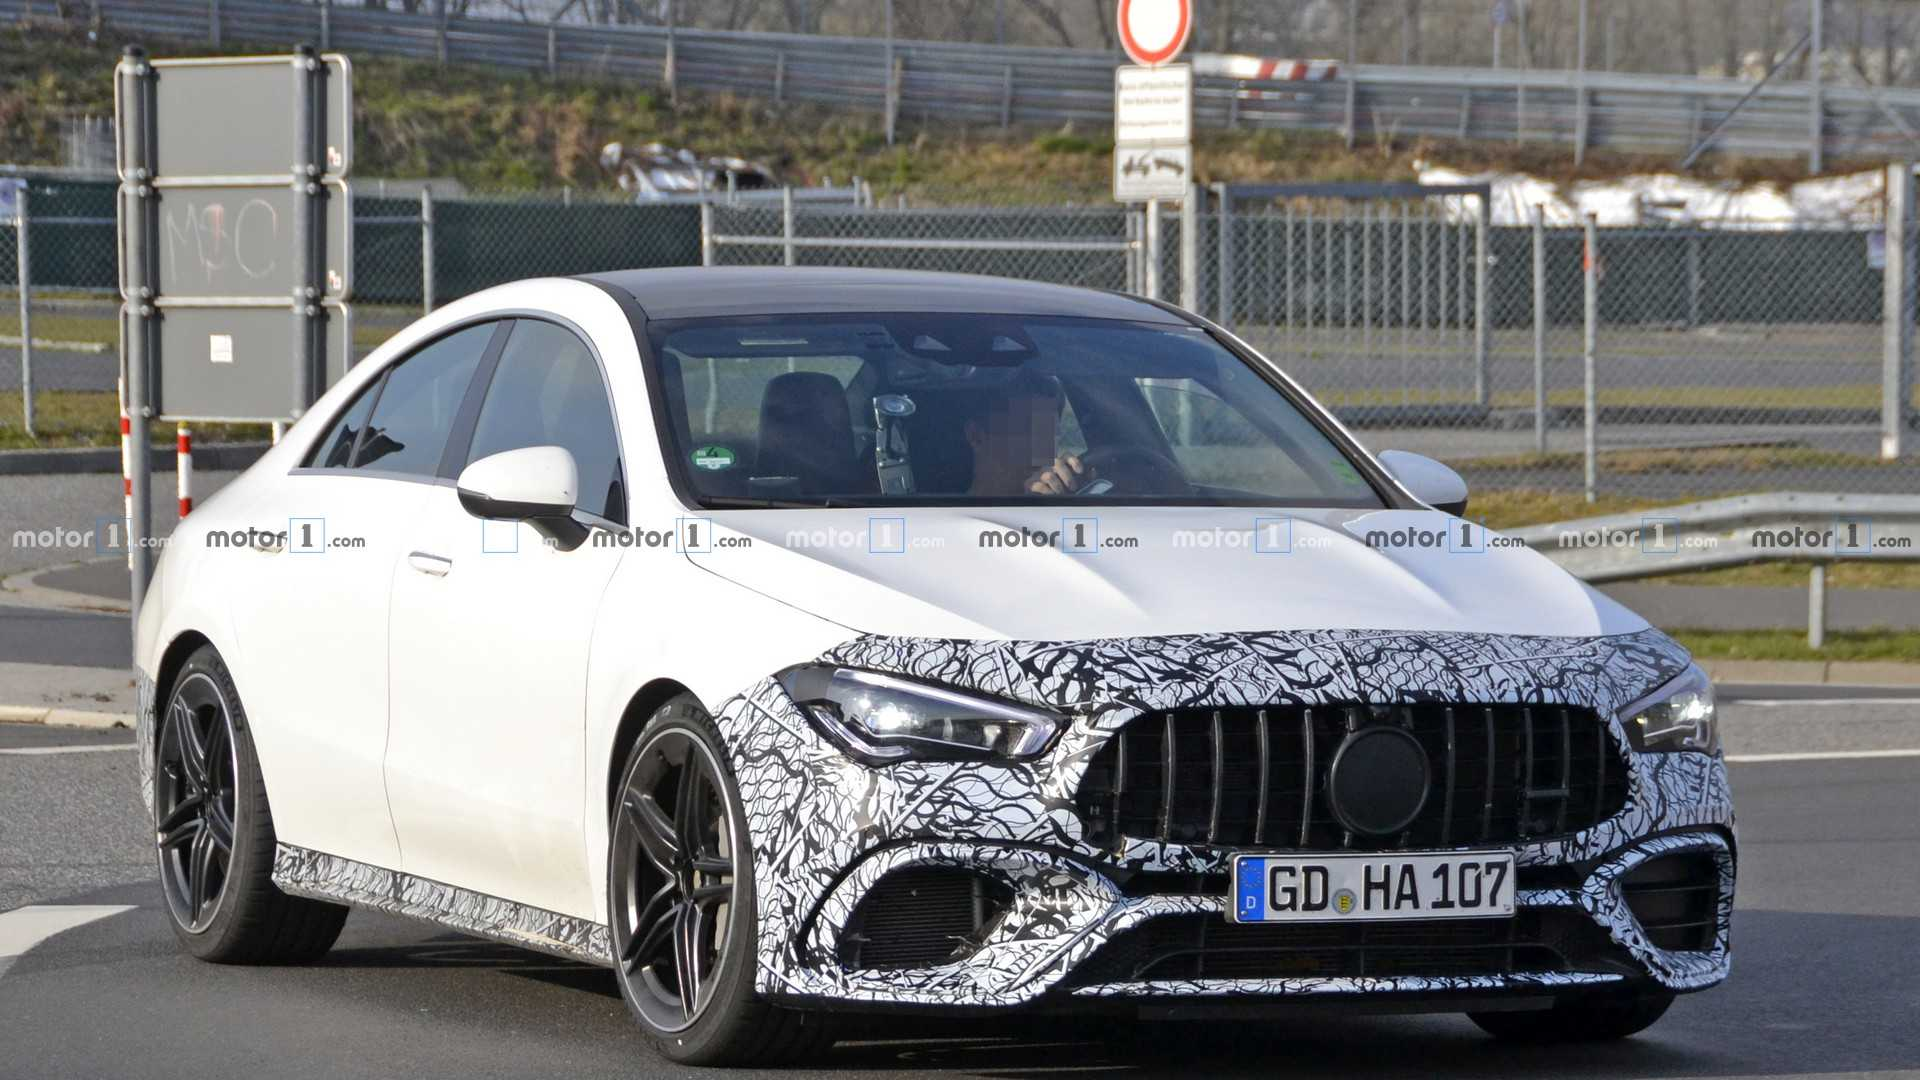 Nuova Mercedes CLA 45 AMG foto spia